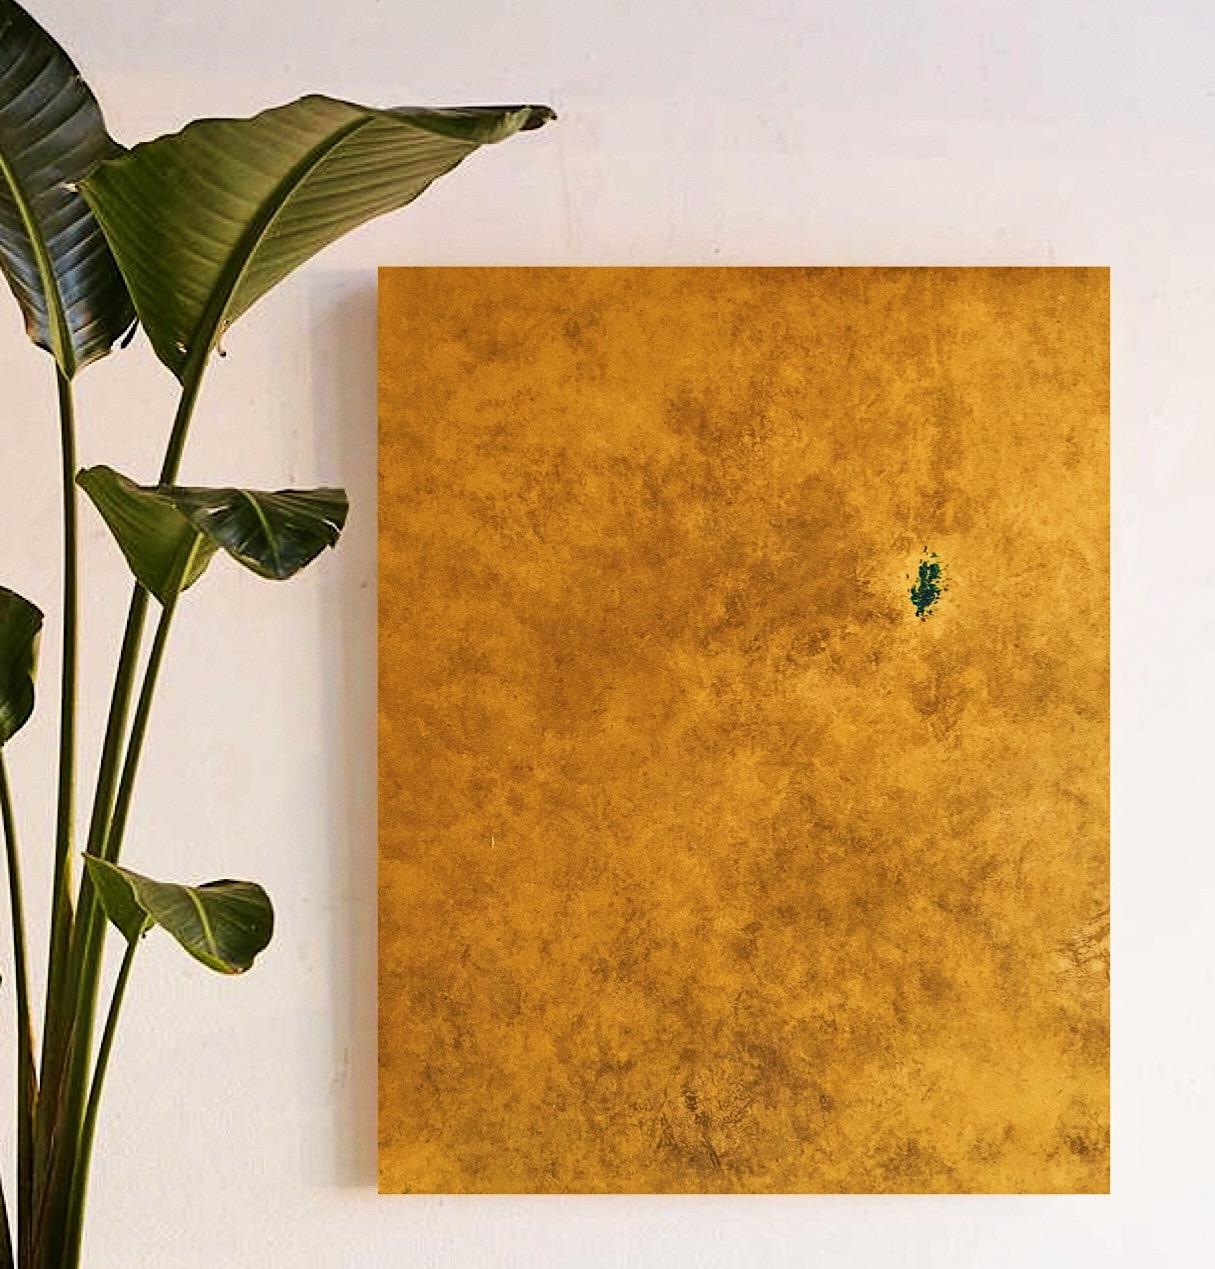 Marine Bonzom - Artiste Peintre Biarritz - Home - Dandelion